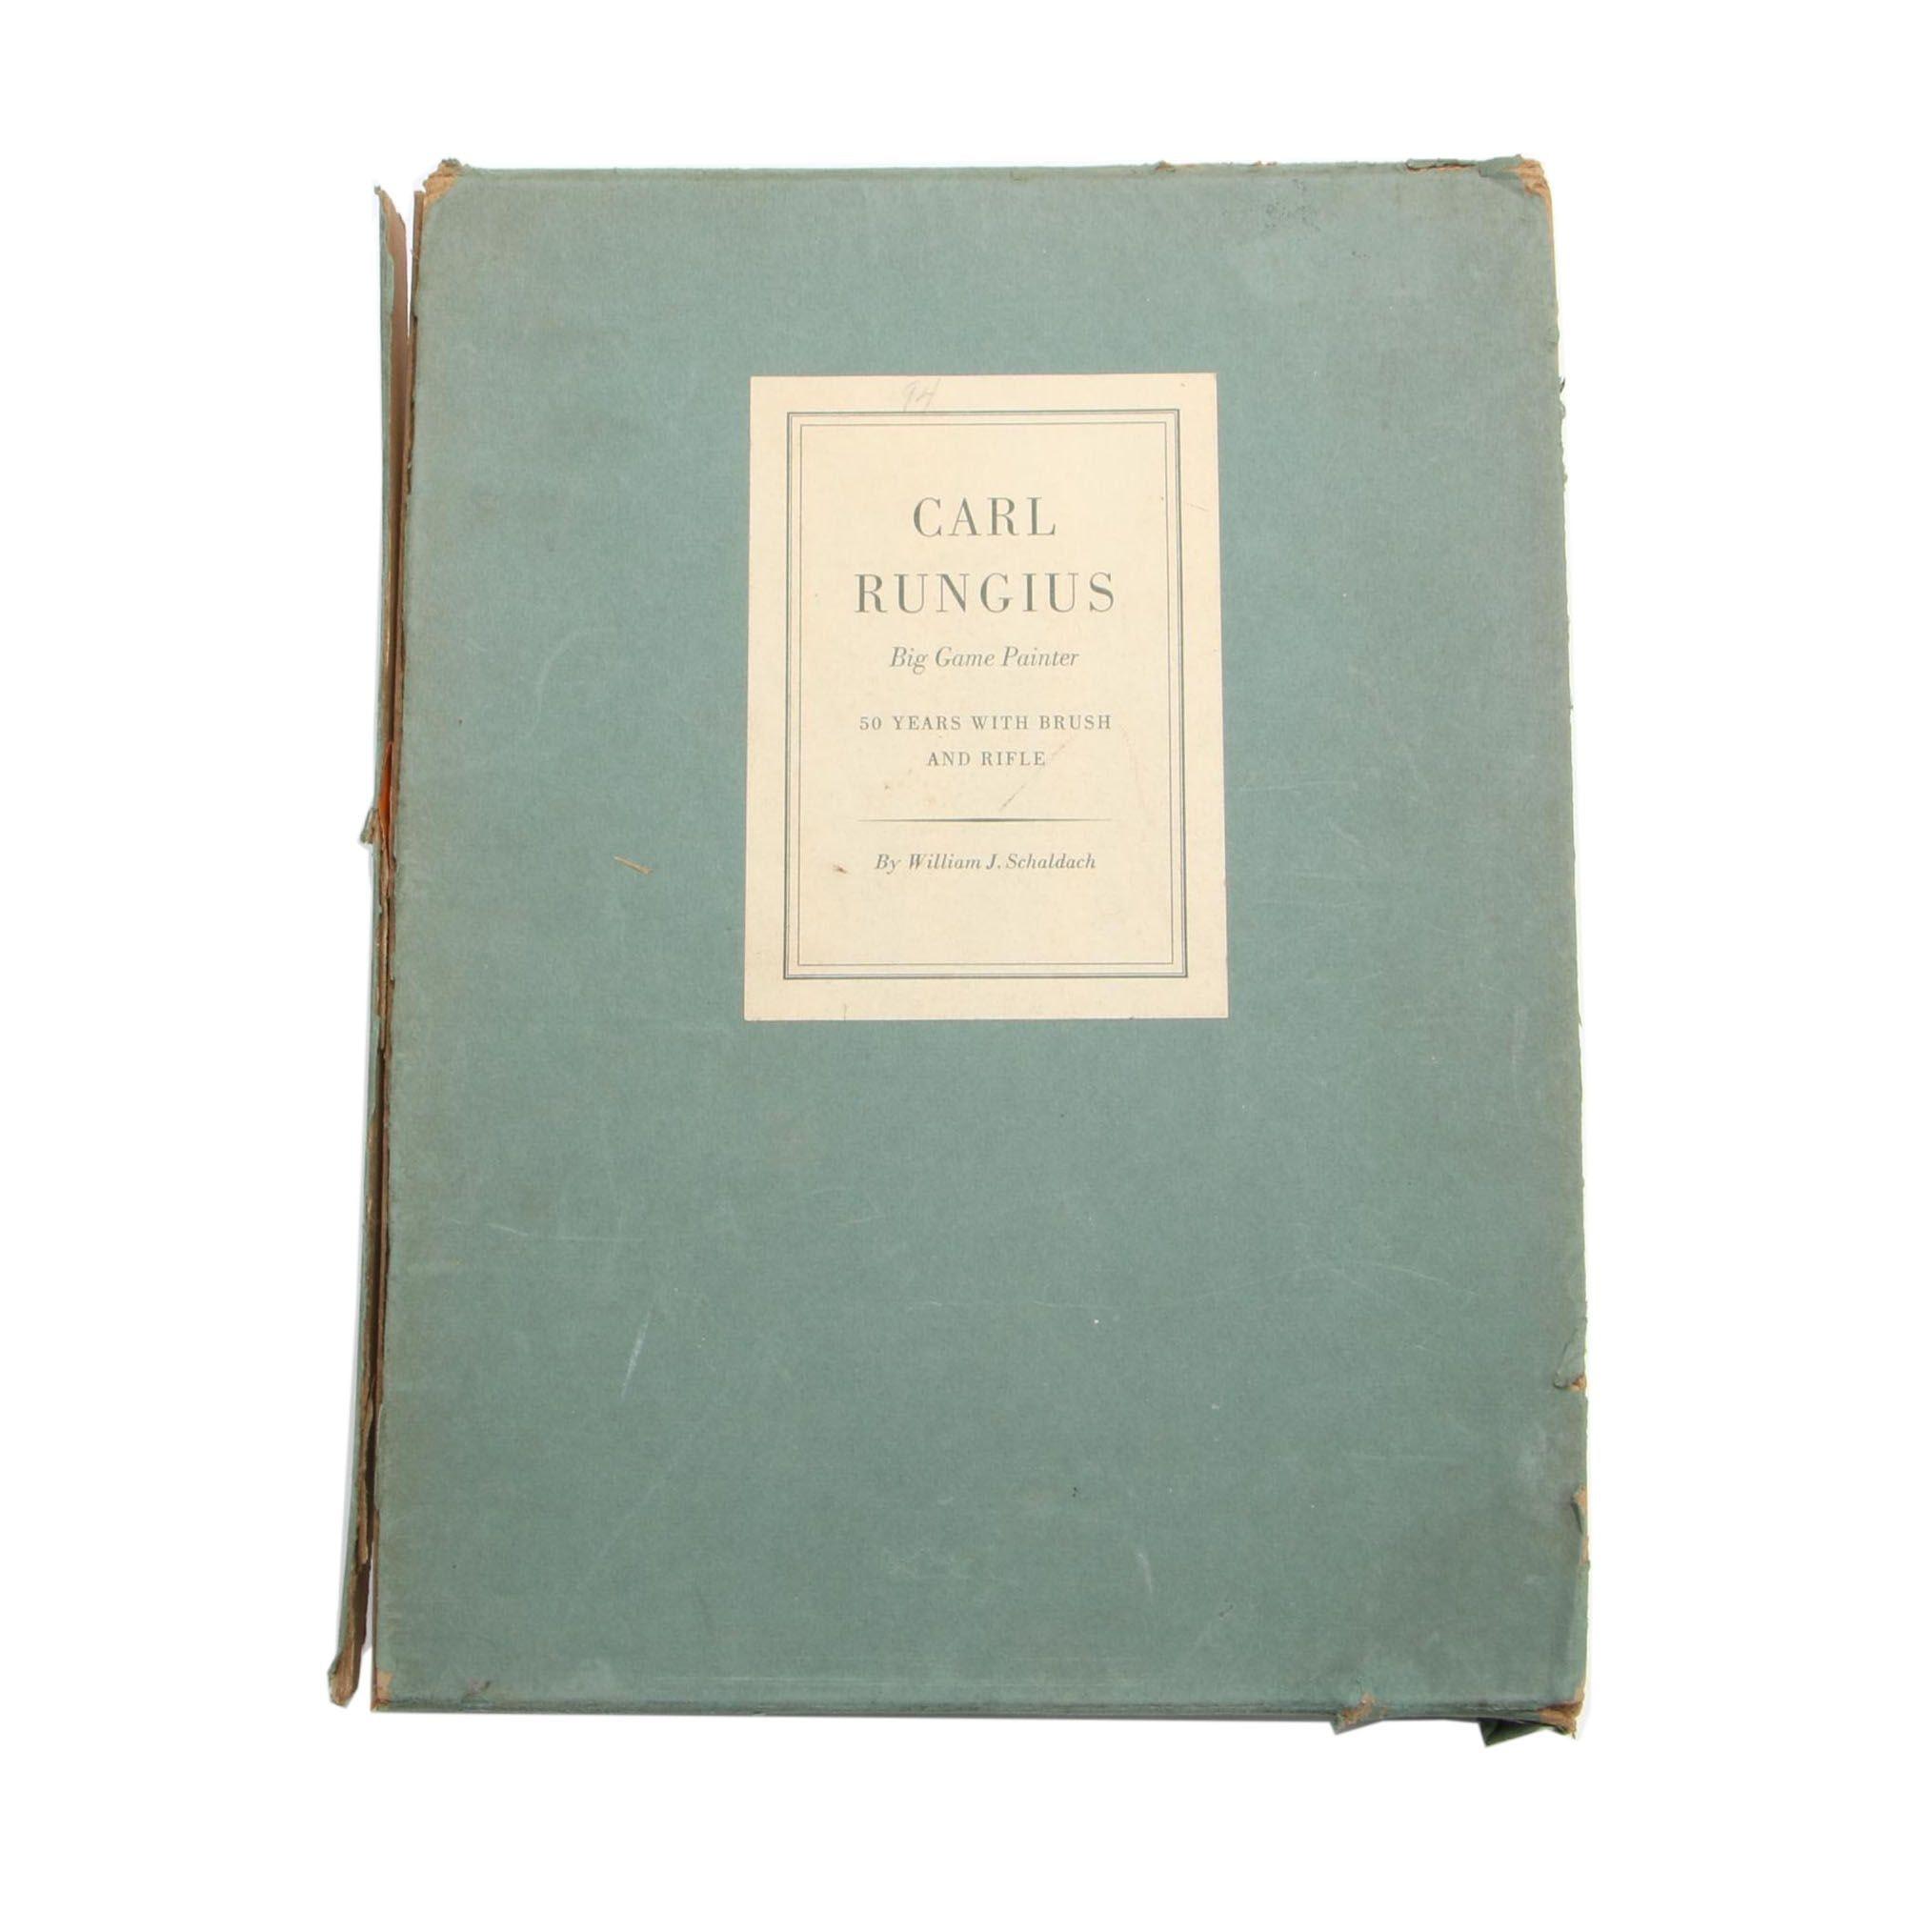 "Limited Edition ""Carl Rungius: Big Game Painter"" by William J. Schaldach"